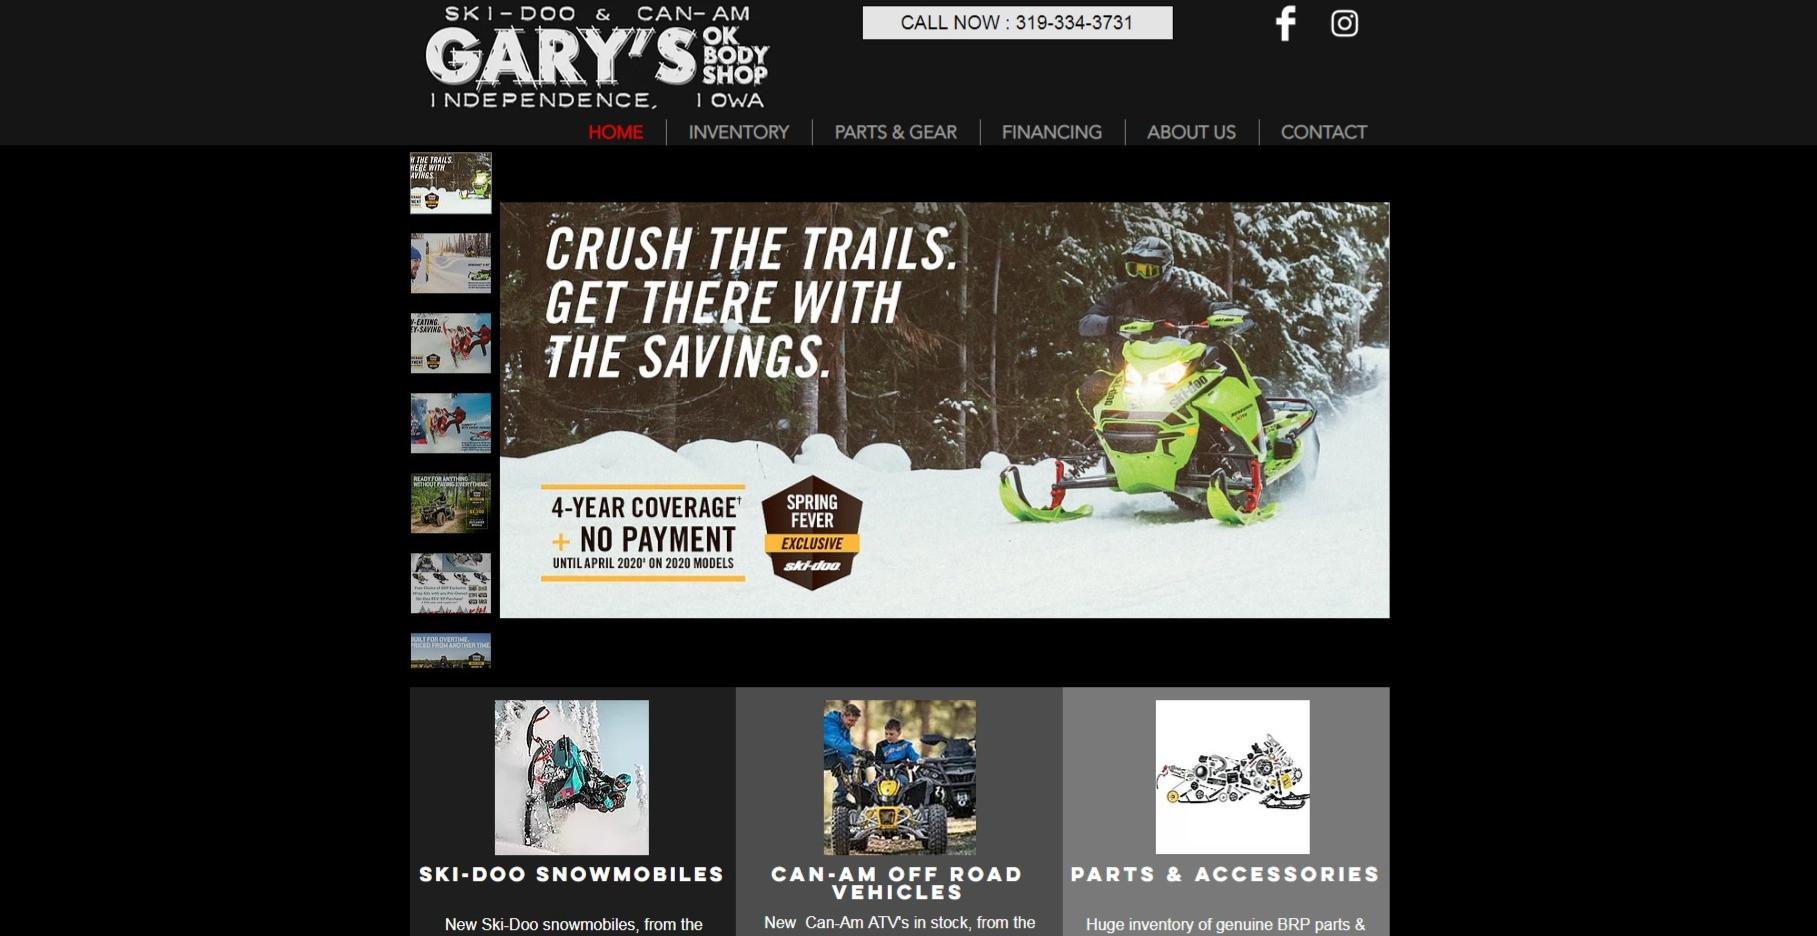 Home | Gary's Ski-Doo & Can-Am | Independence, Iowa